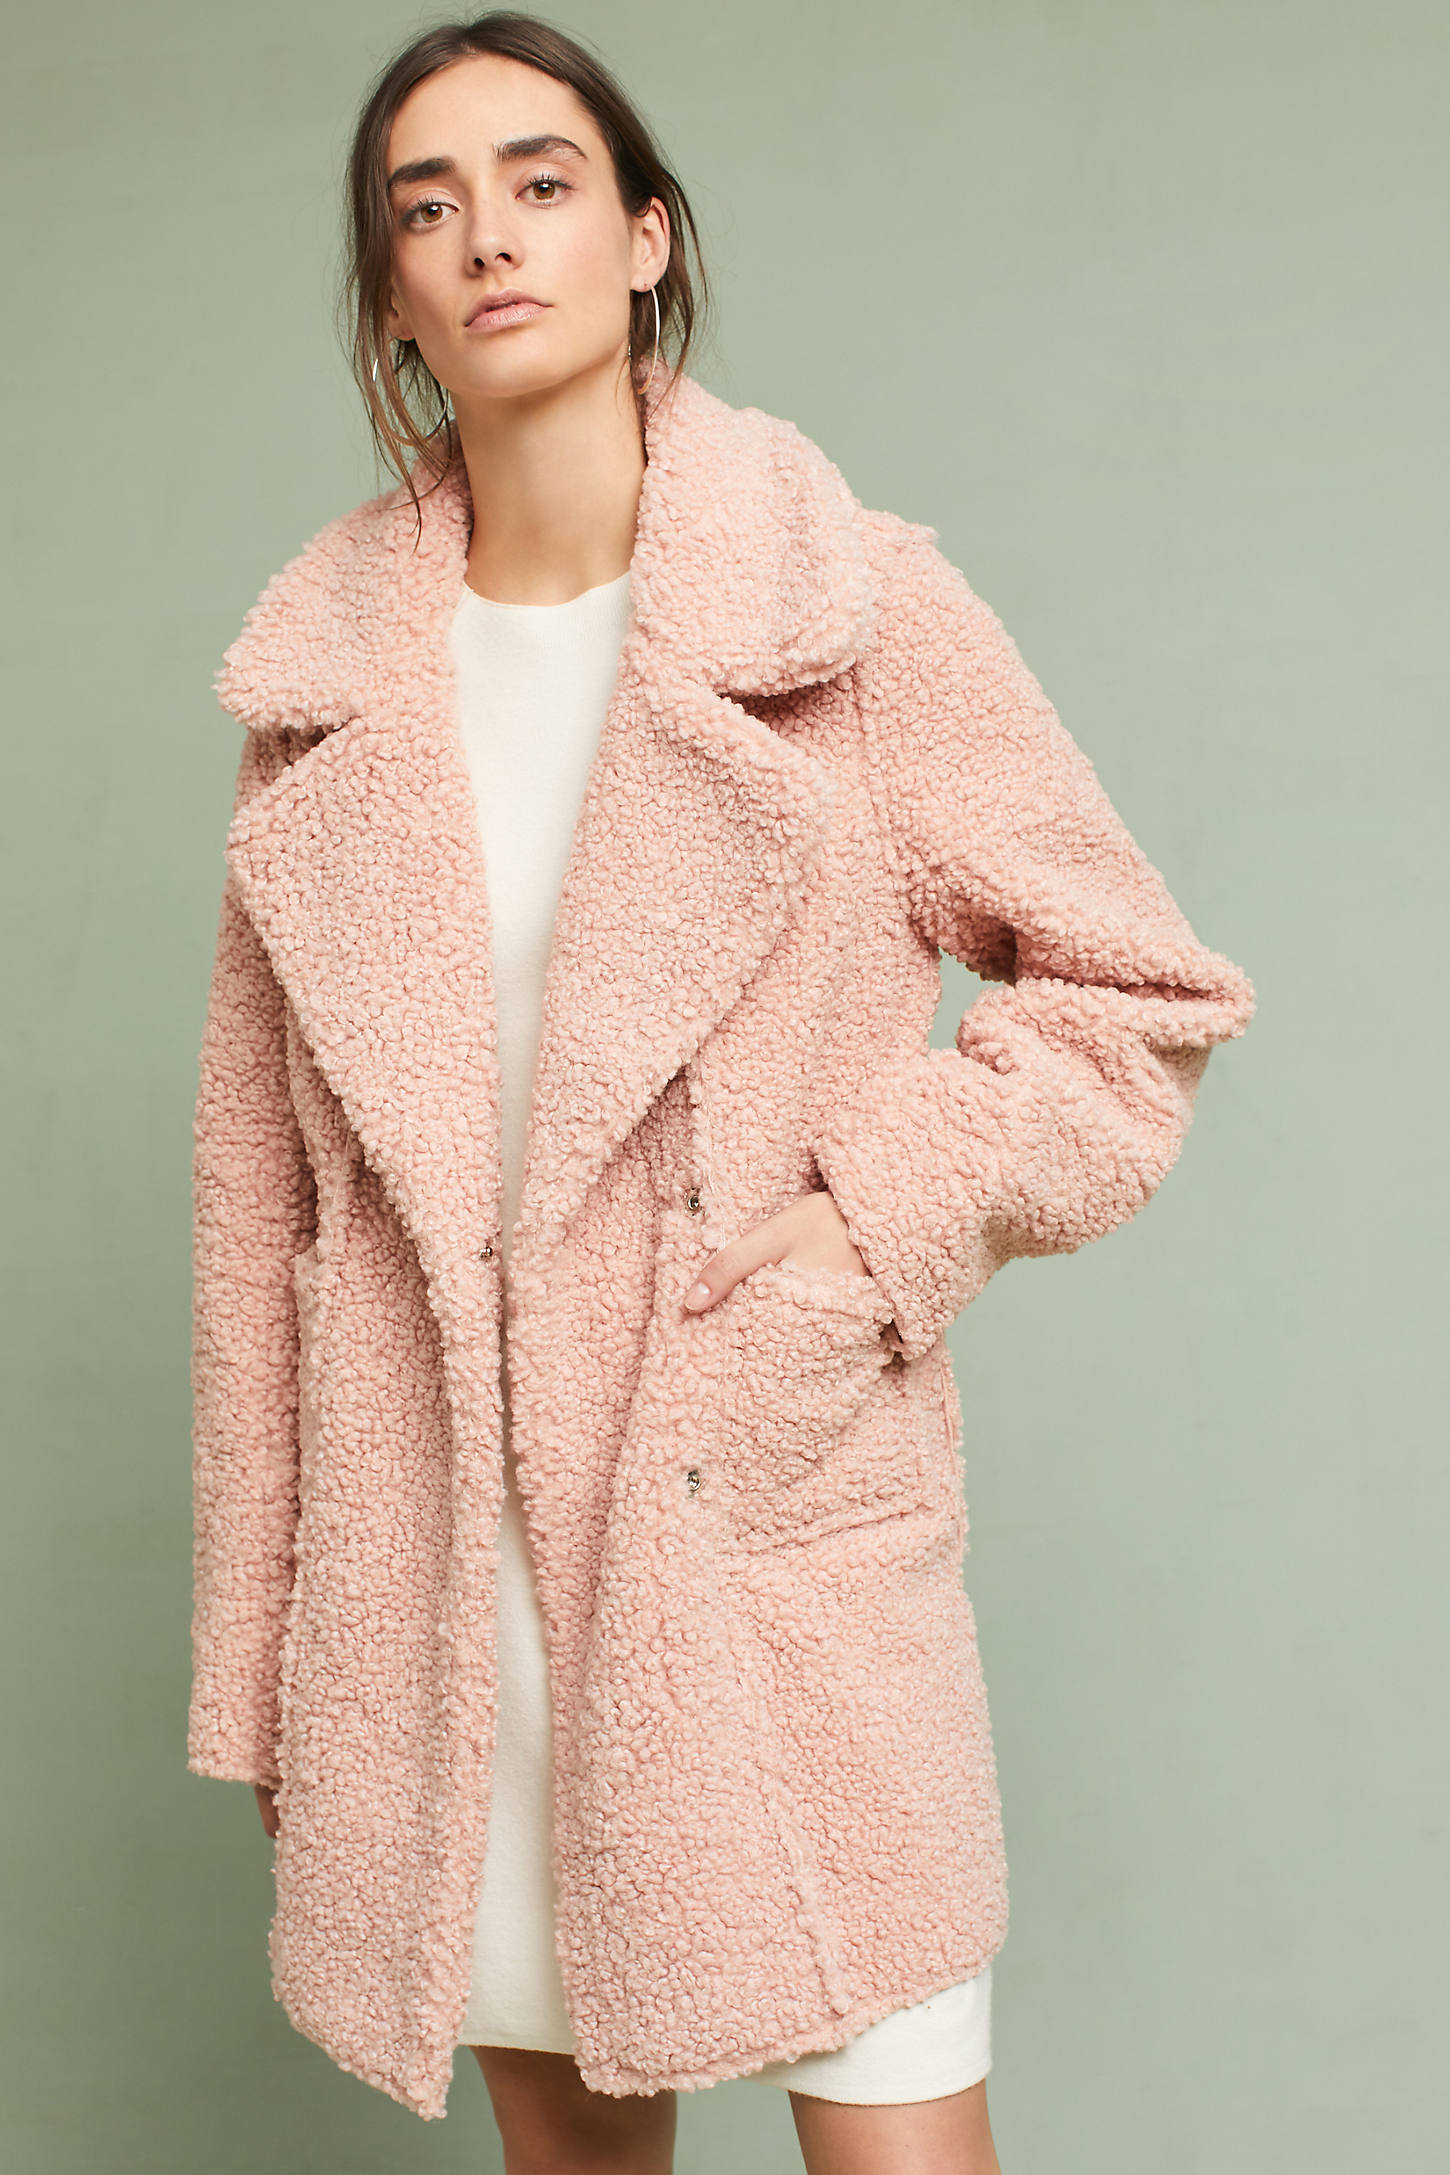 Blushed Sherpa Reversible Coat